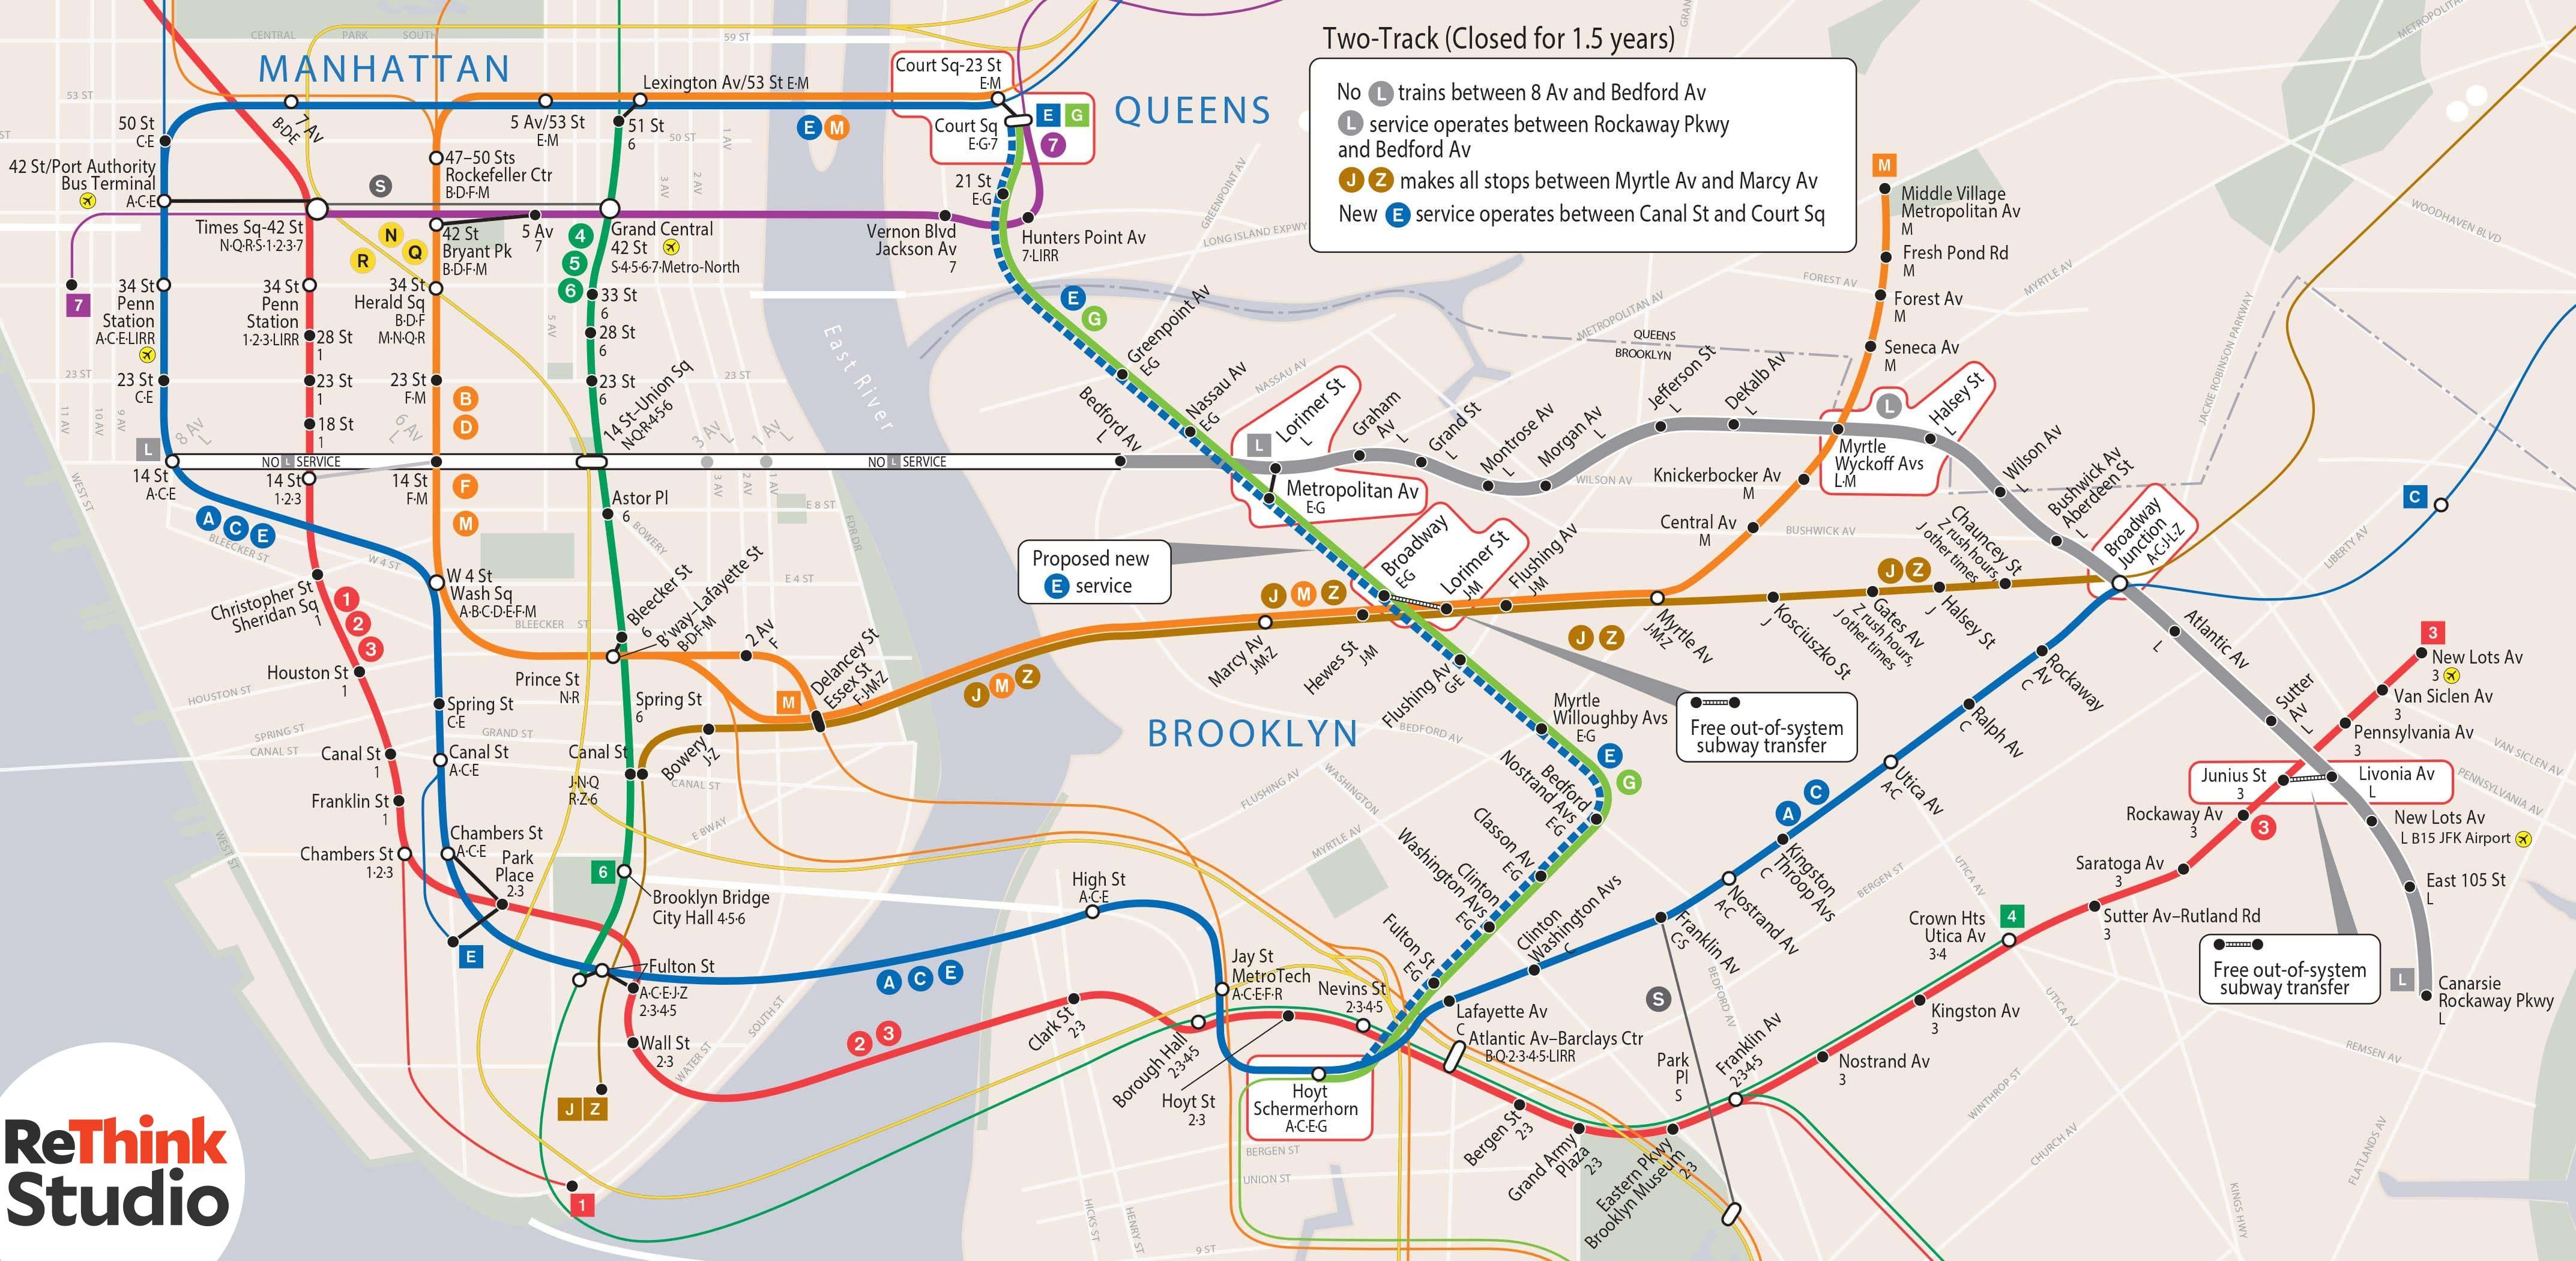 Subway Map E Line.Solving The L Train Crisis Extending The E Line Along The G Line